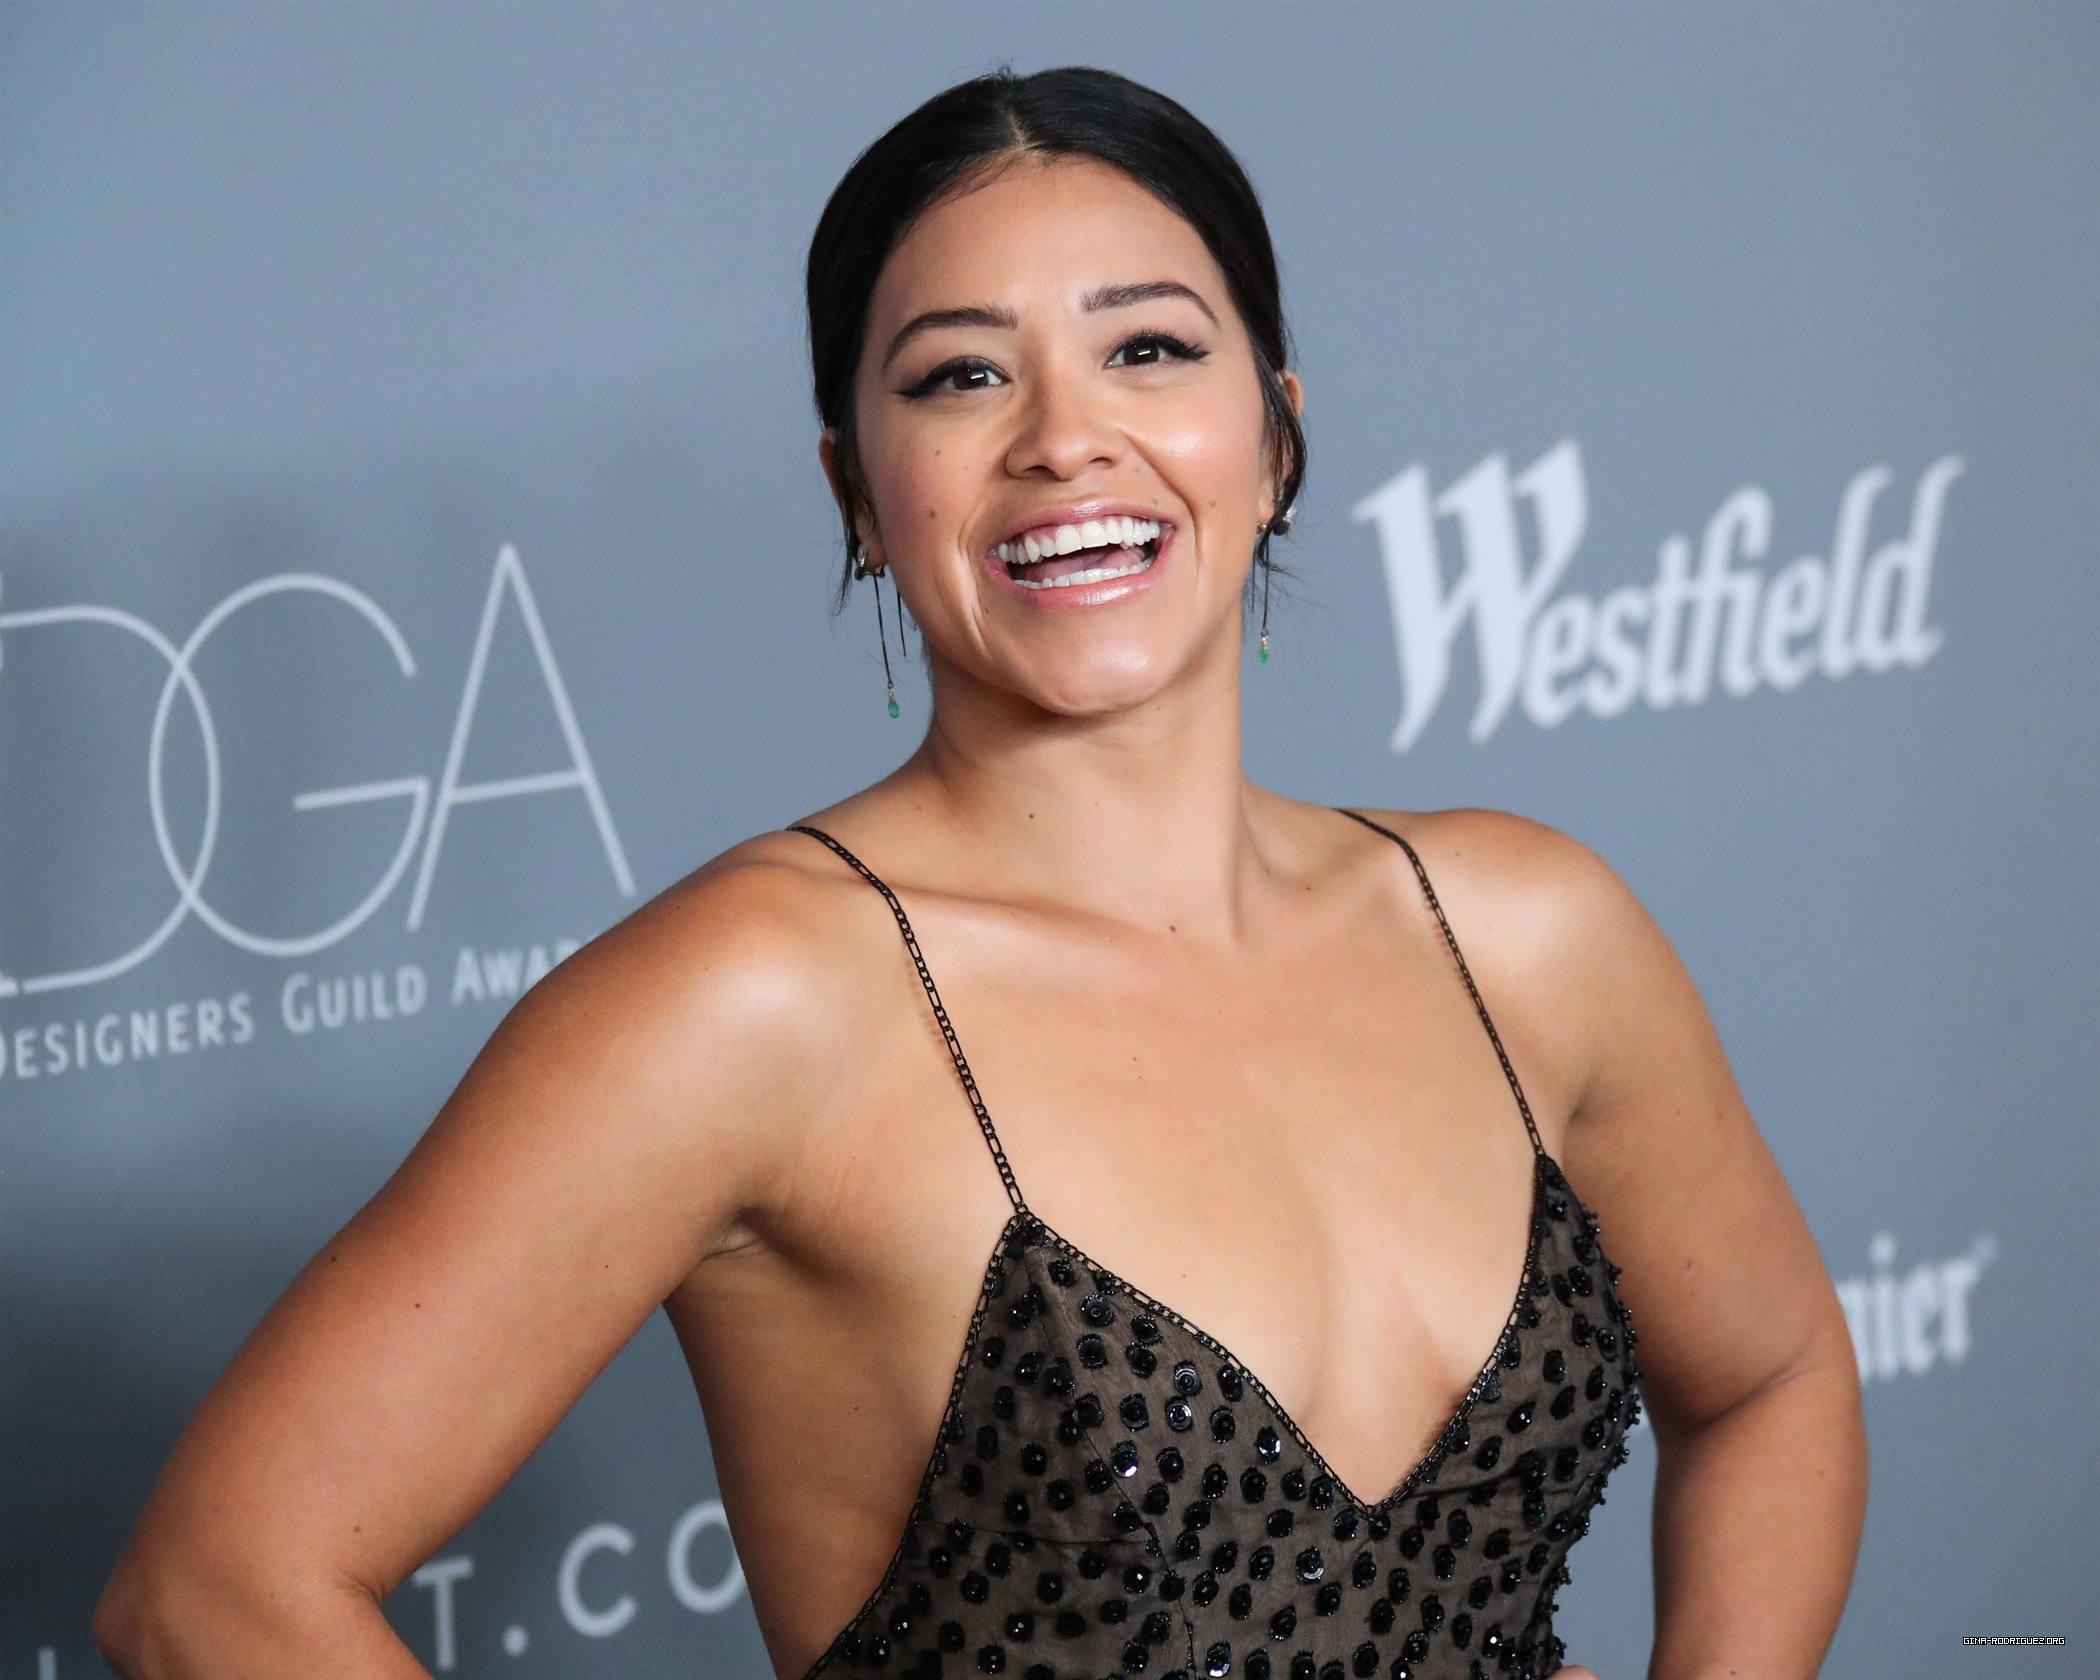 Press: Gina Rodriguez to Star in Sci-Fi Thriller 'Awake' for Netflix